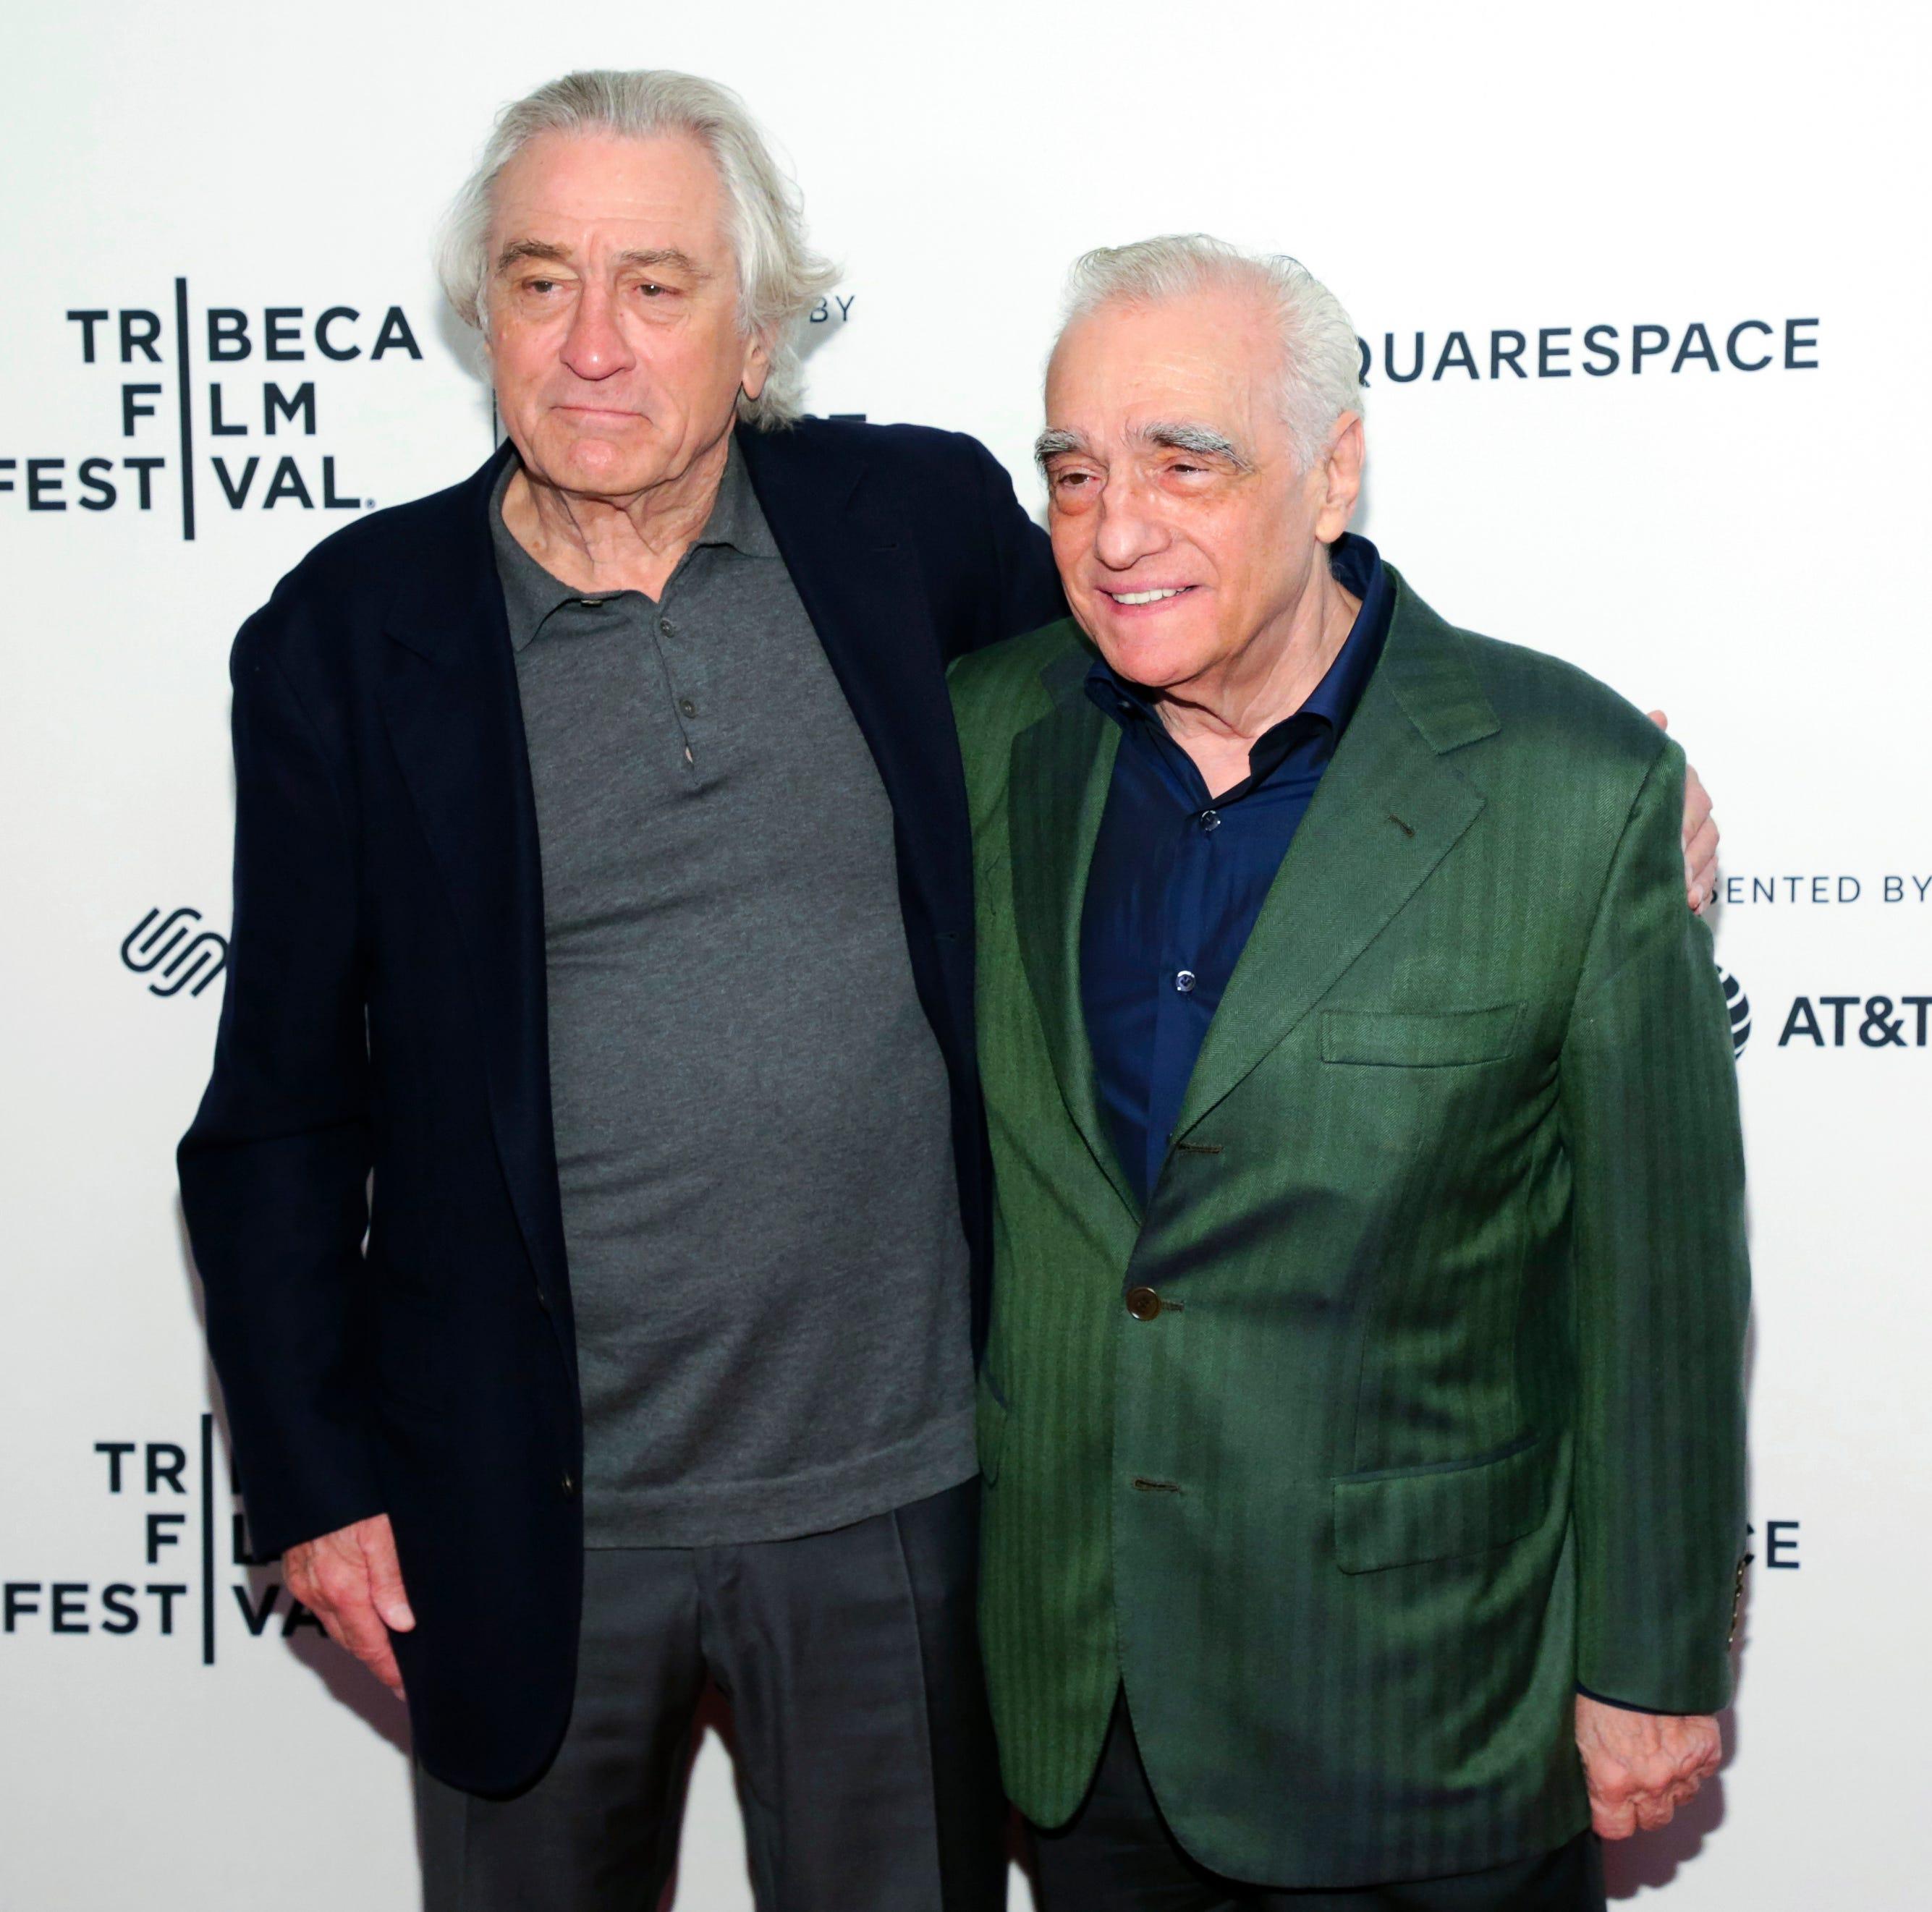 Ahead of 'The Irishman,' Scorsese and De Niro look back at Tribeca